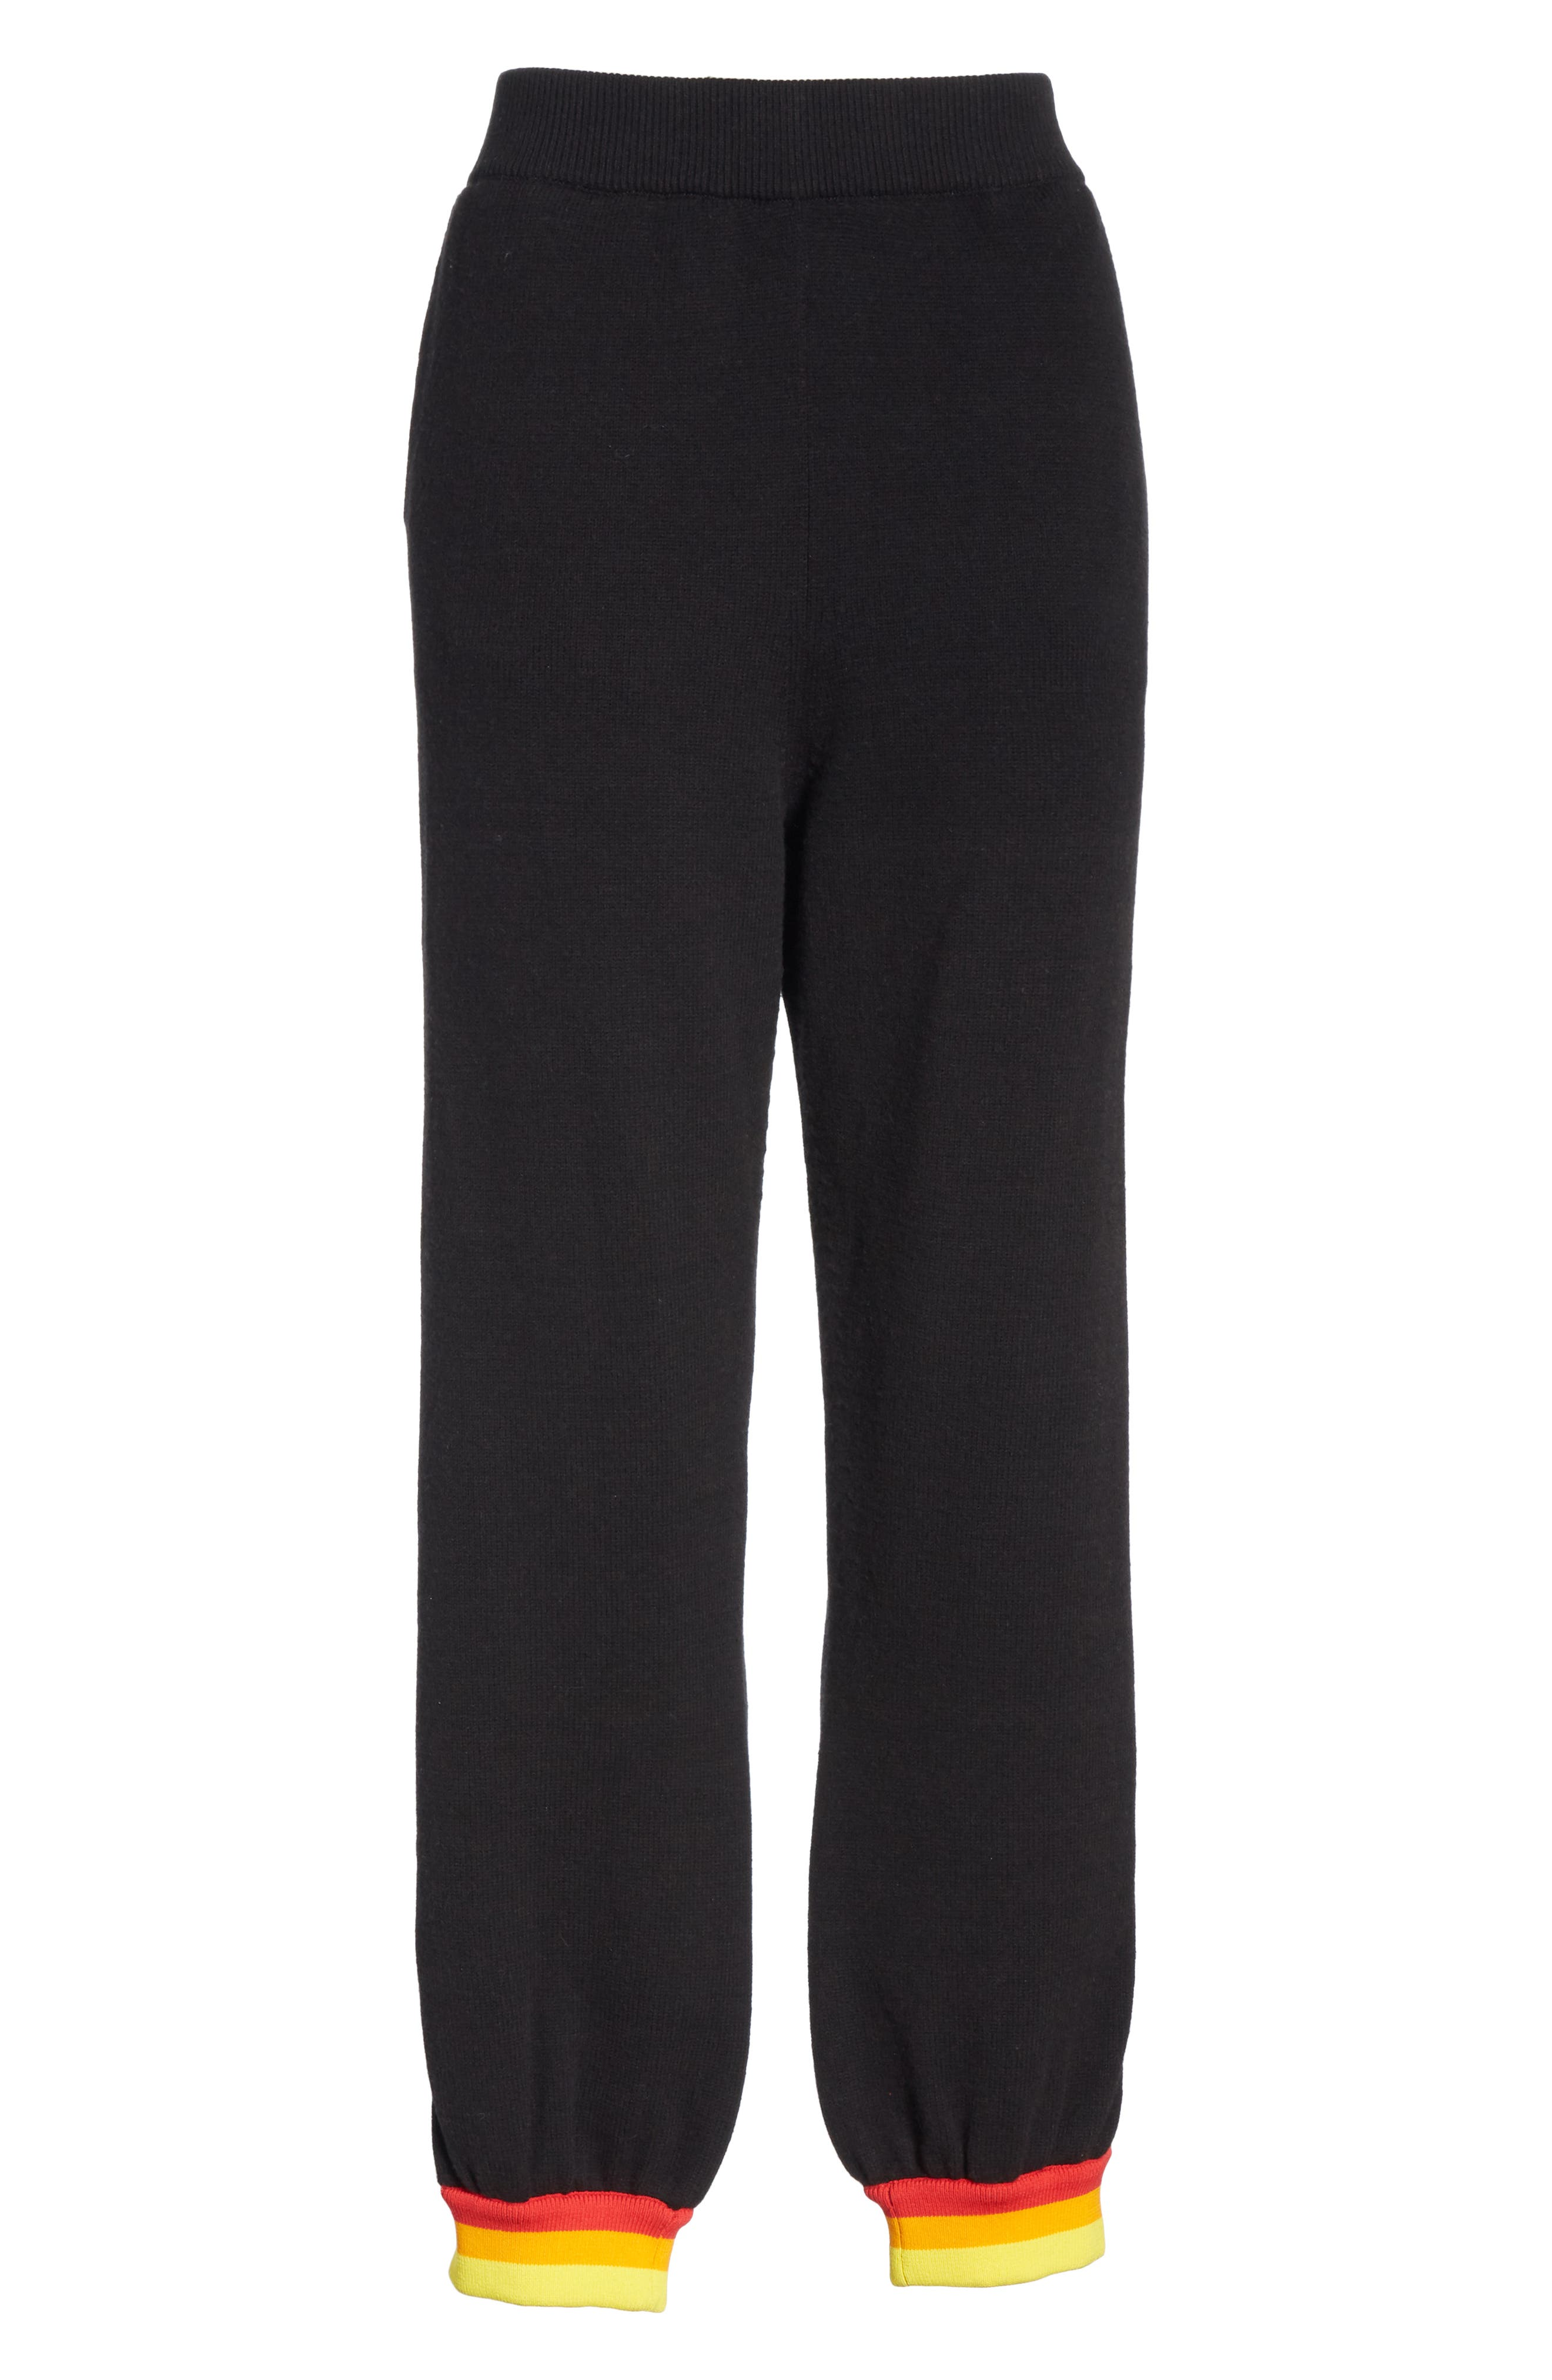 OPENING CEREMONY,                             Unisex Jogger Pants,                             Alternate thumbnail 7, color,                             BLACK MULTI